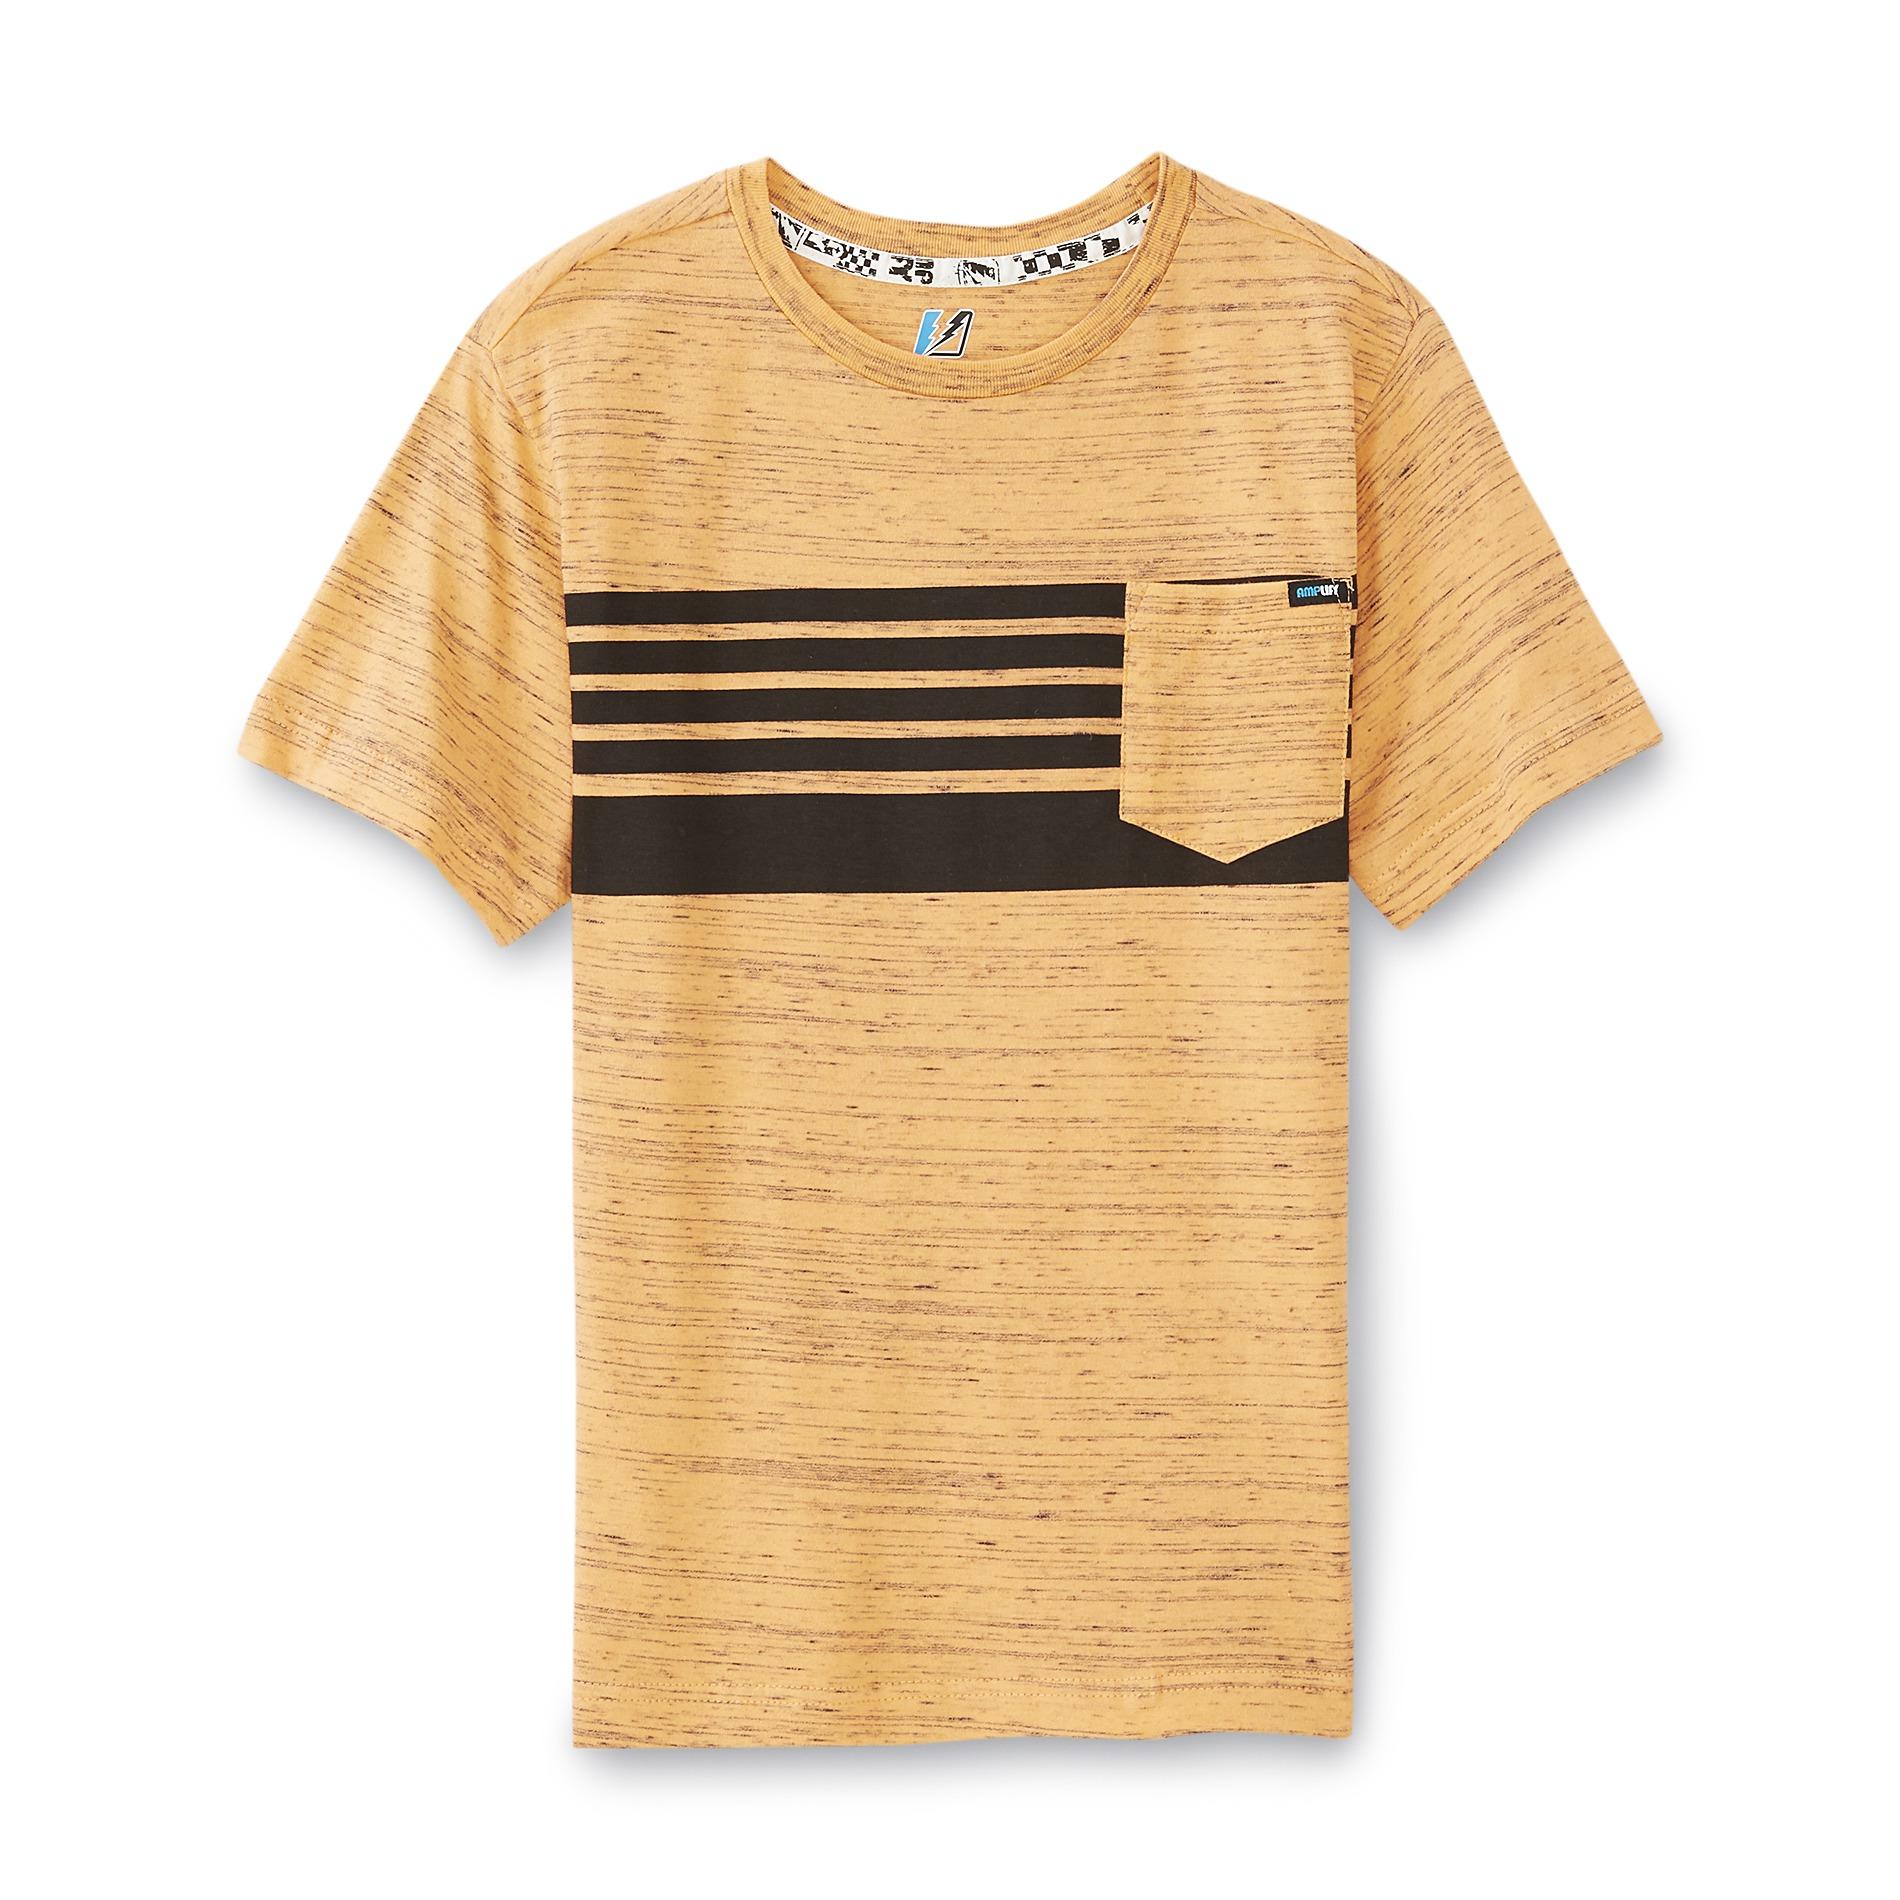 Boy's Pocket T-Shirt - Striped